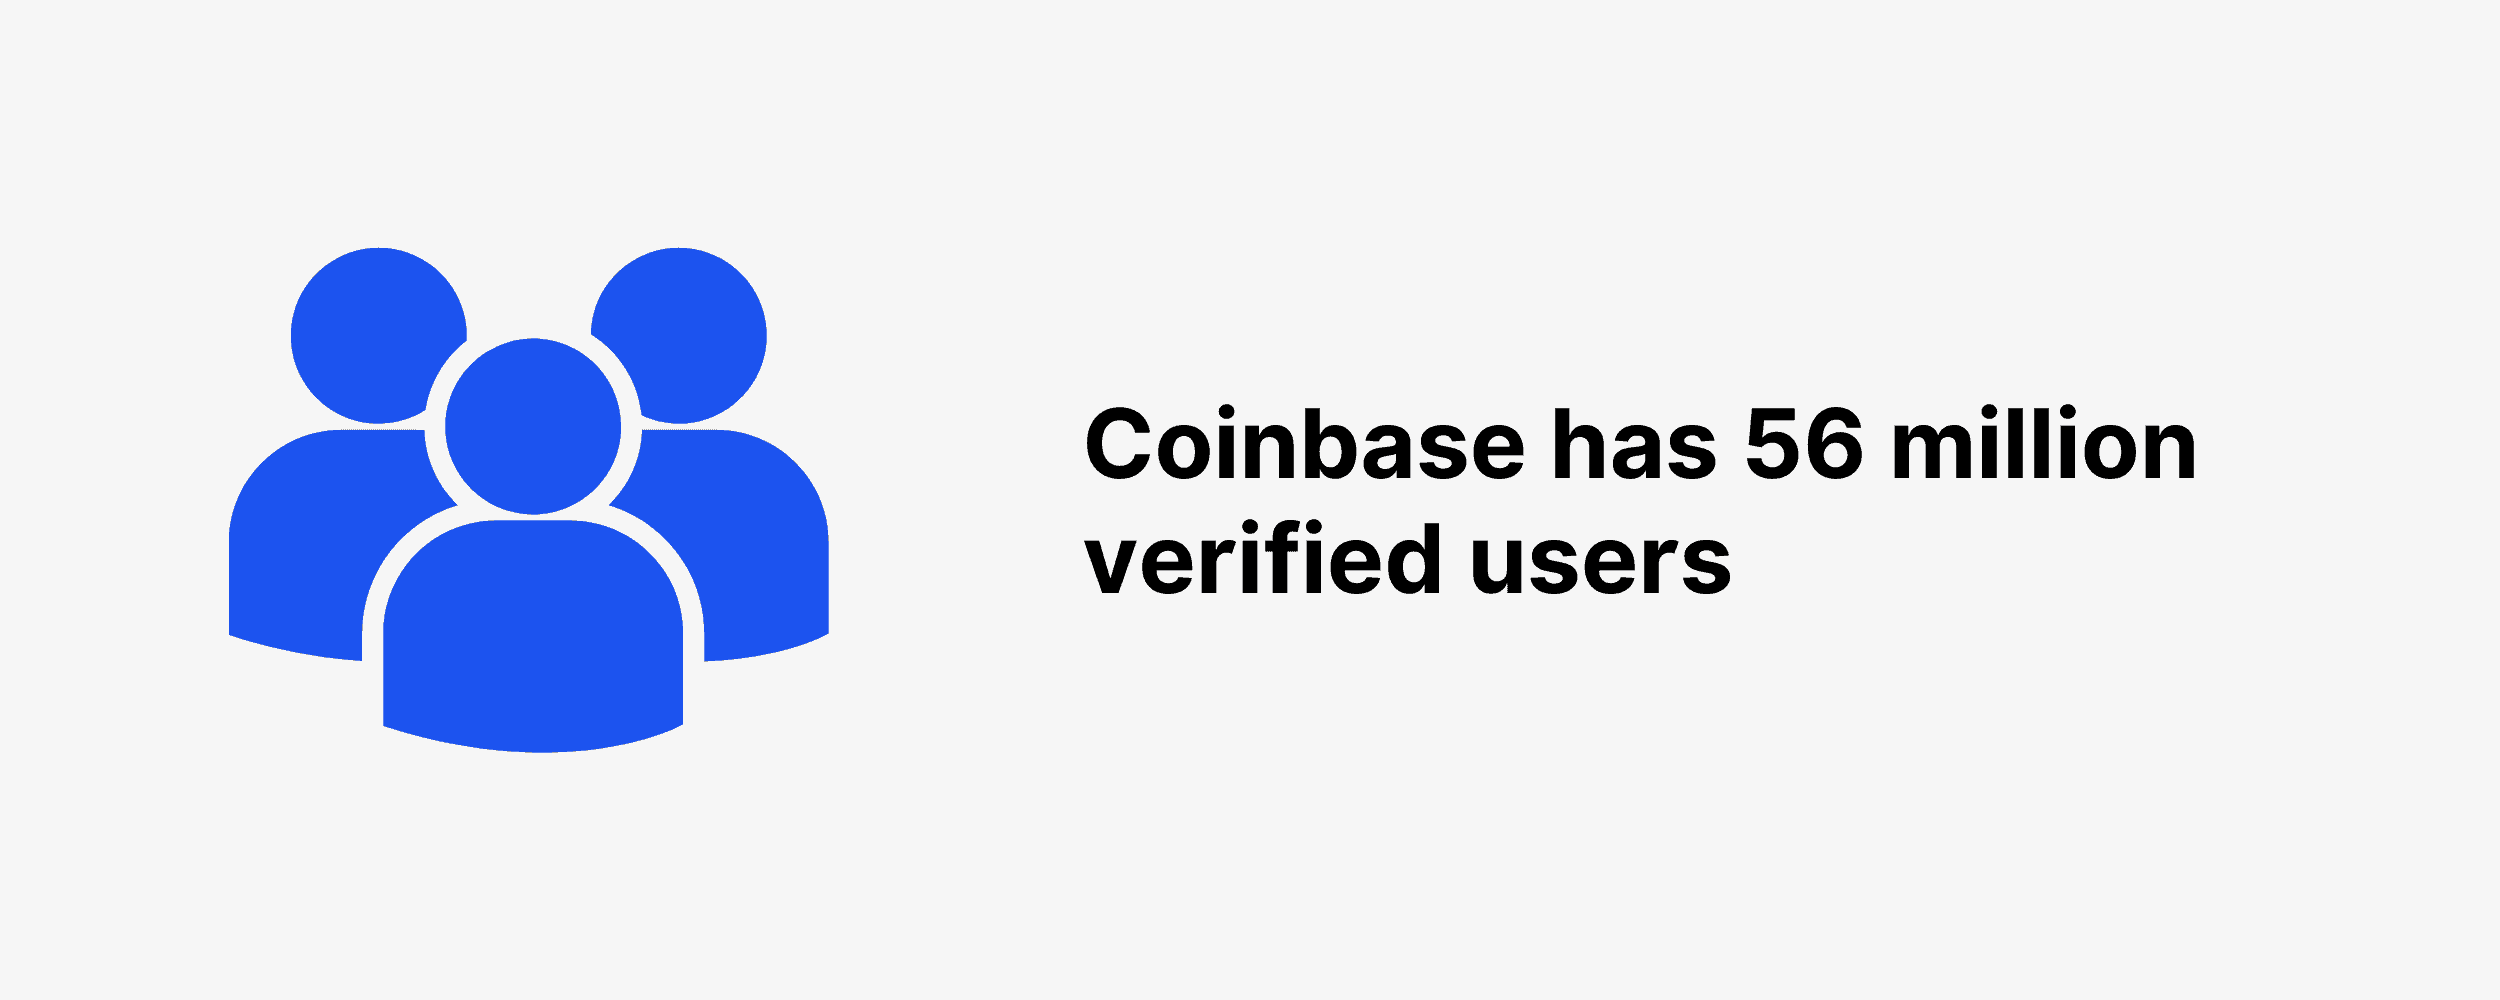 Coinbase has 56 million verified users